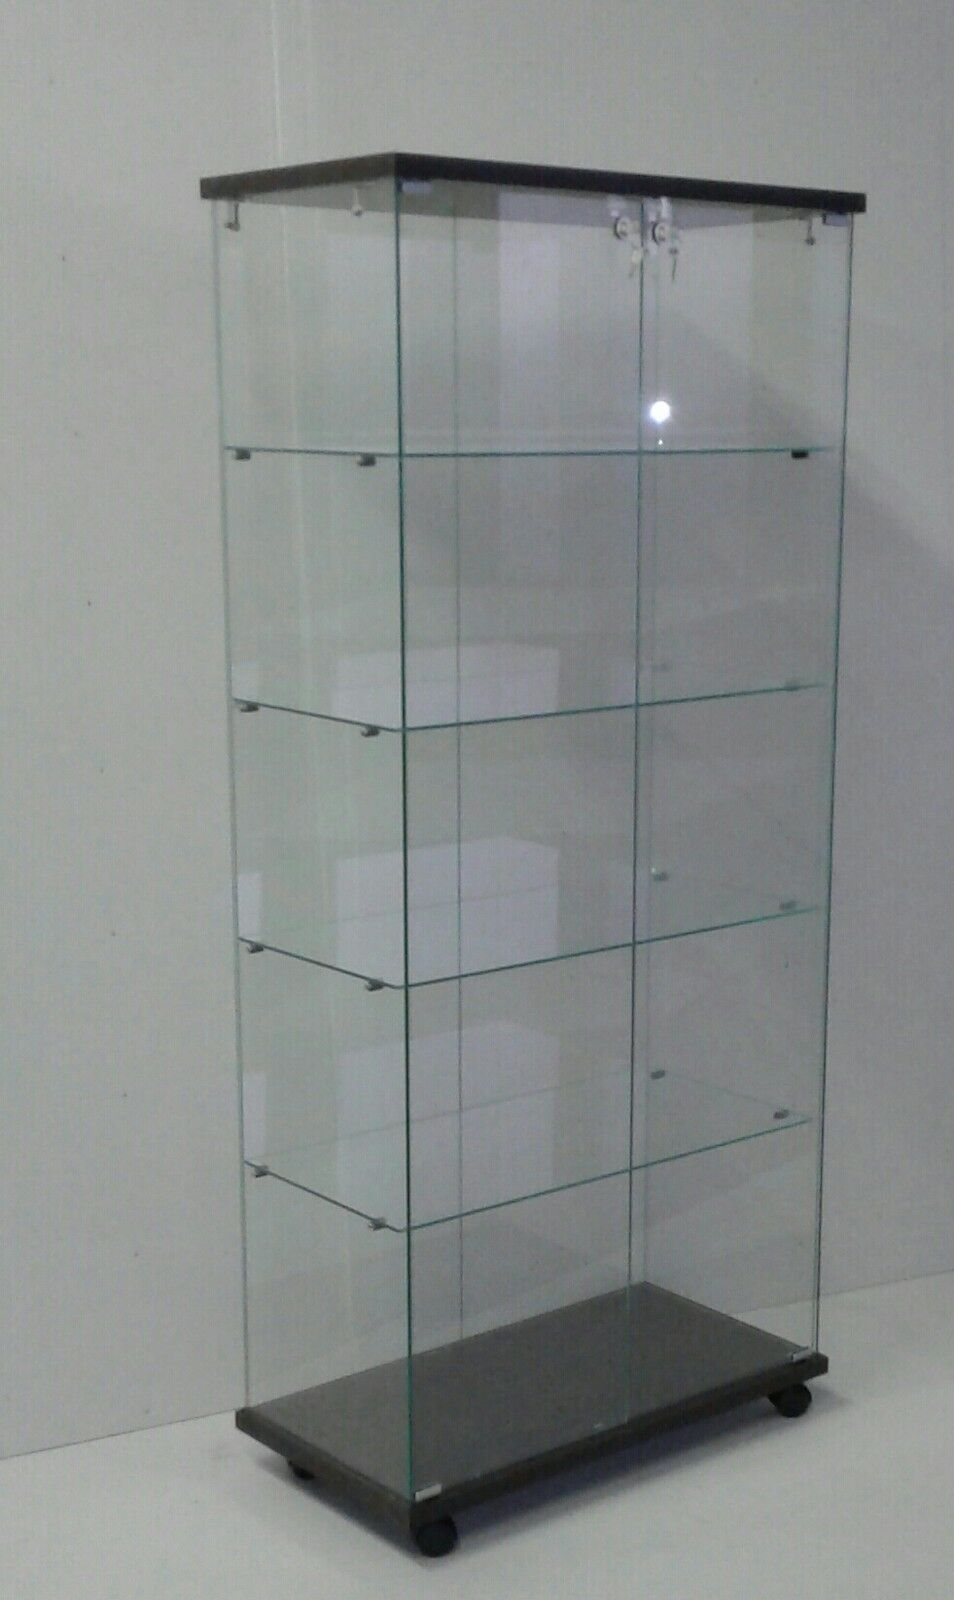 Vitrine brun fonce,vitrines,vitrines pour collectionneurs,vitrine collectionneurs,vitrine collectionneurs,vitrine verre 810a8e